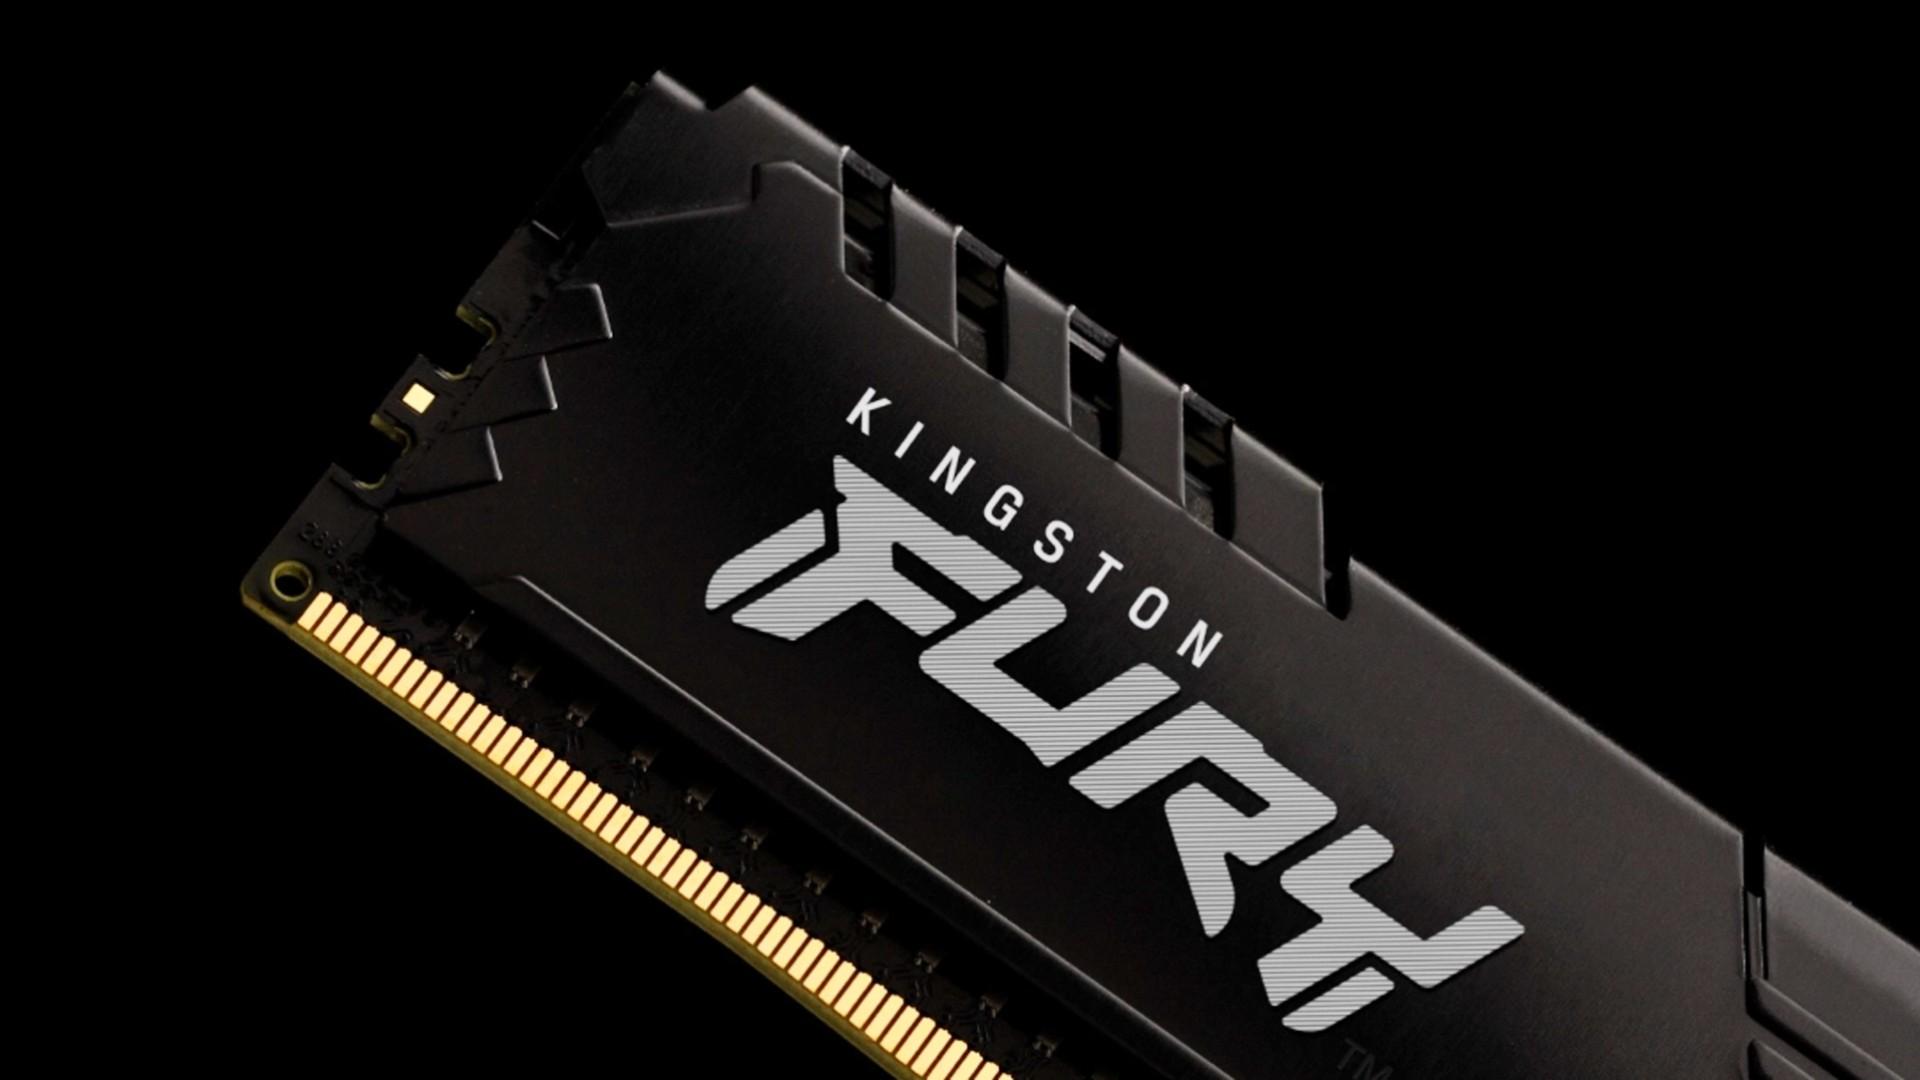 Kingston is still releasing DDR3 for older gaming PCs despite DDR5 RAM's arrival